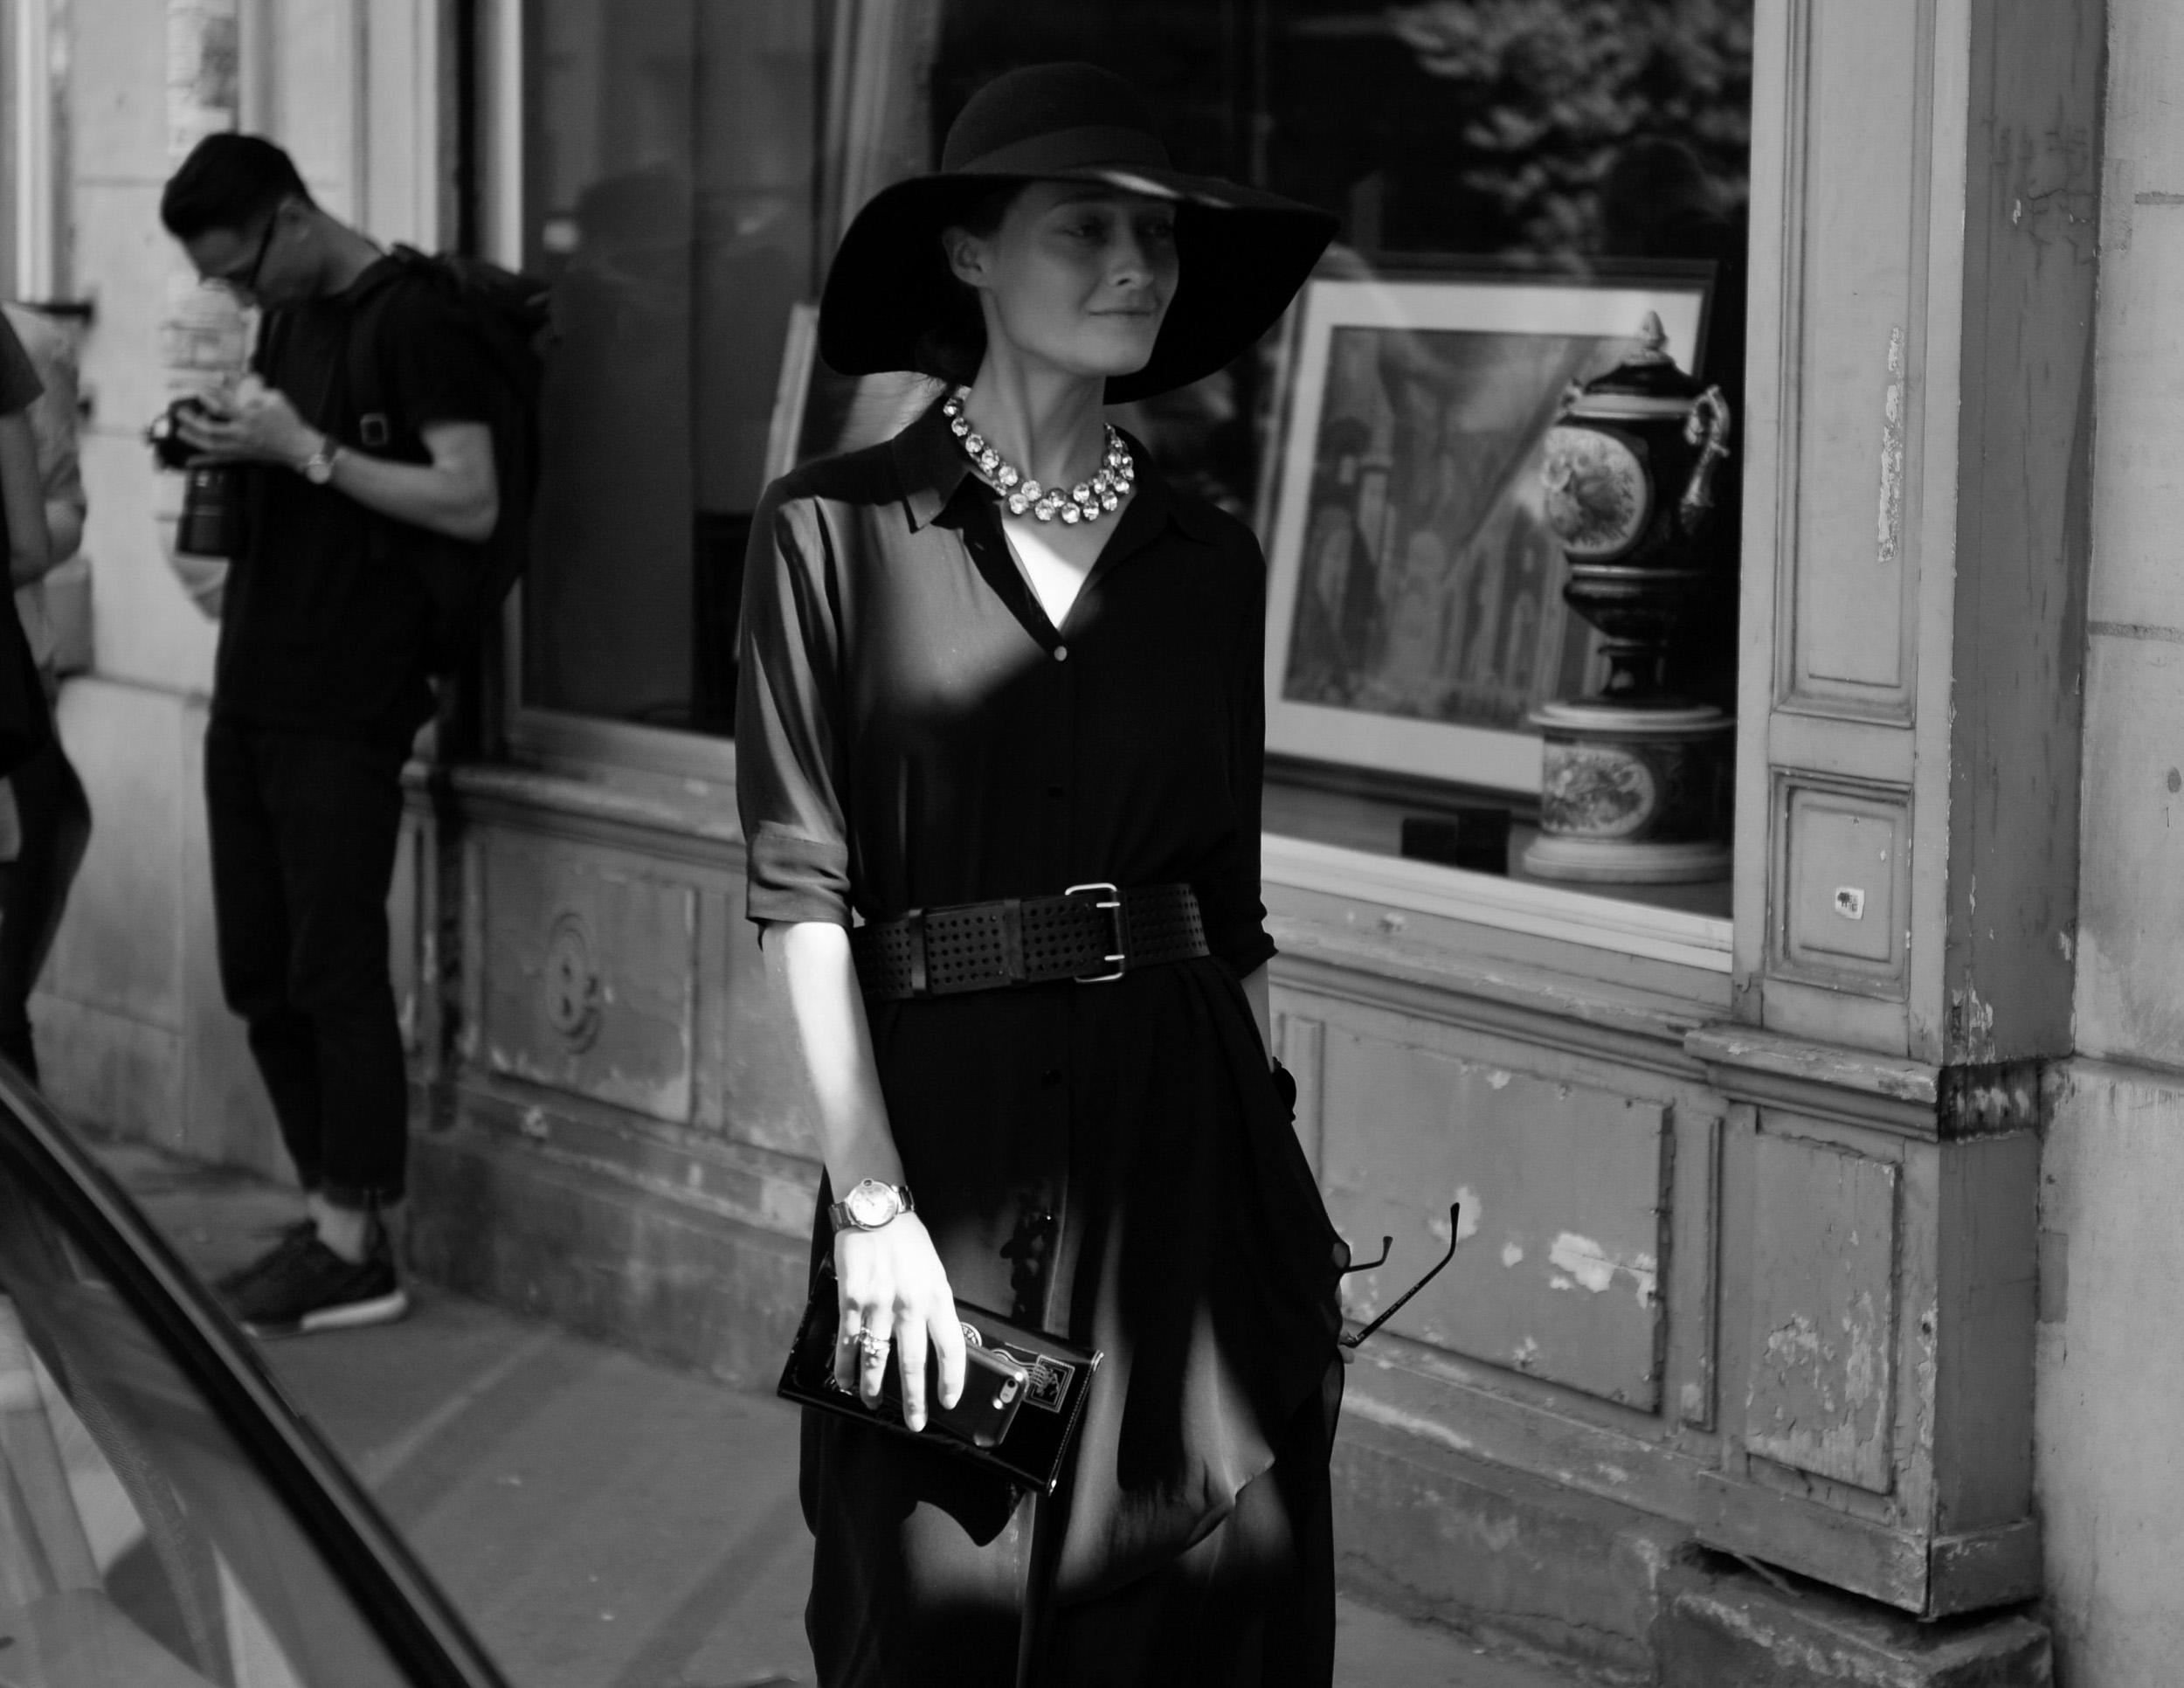 StreetStyle_ParisFashionWeek_LeandroJusten_118.jpg